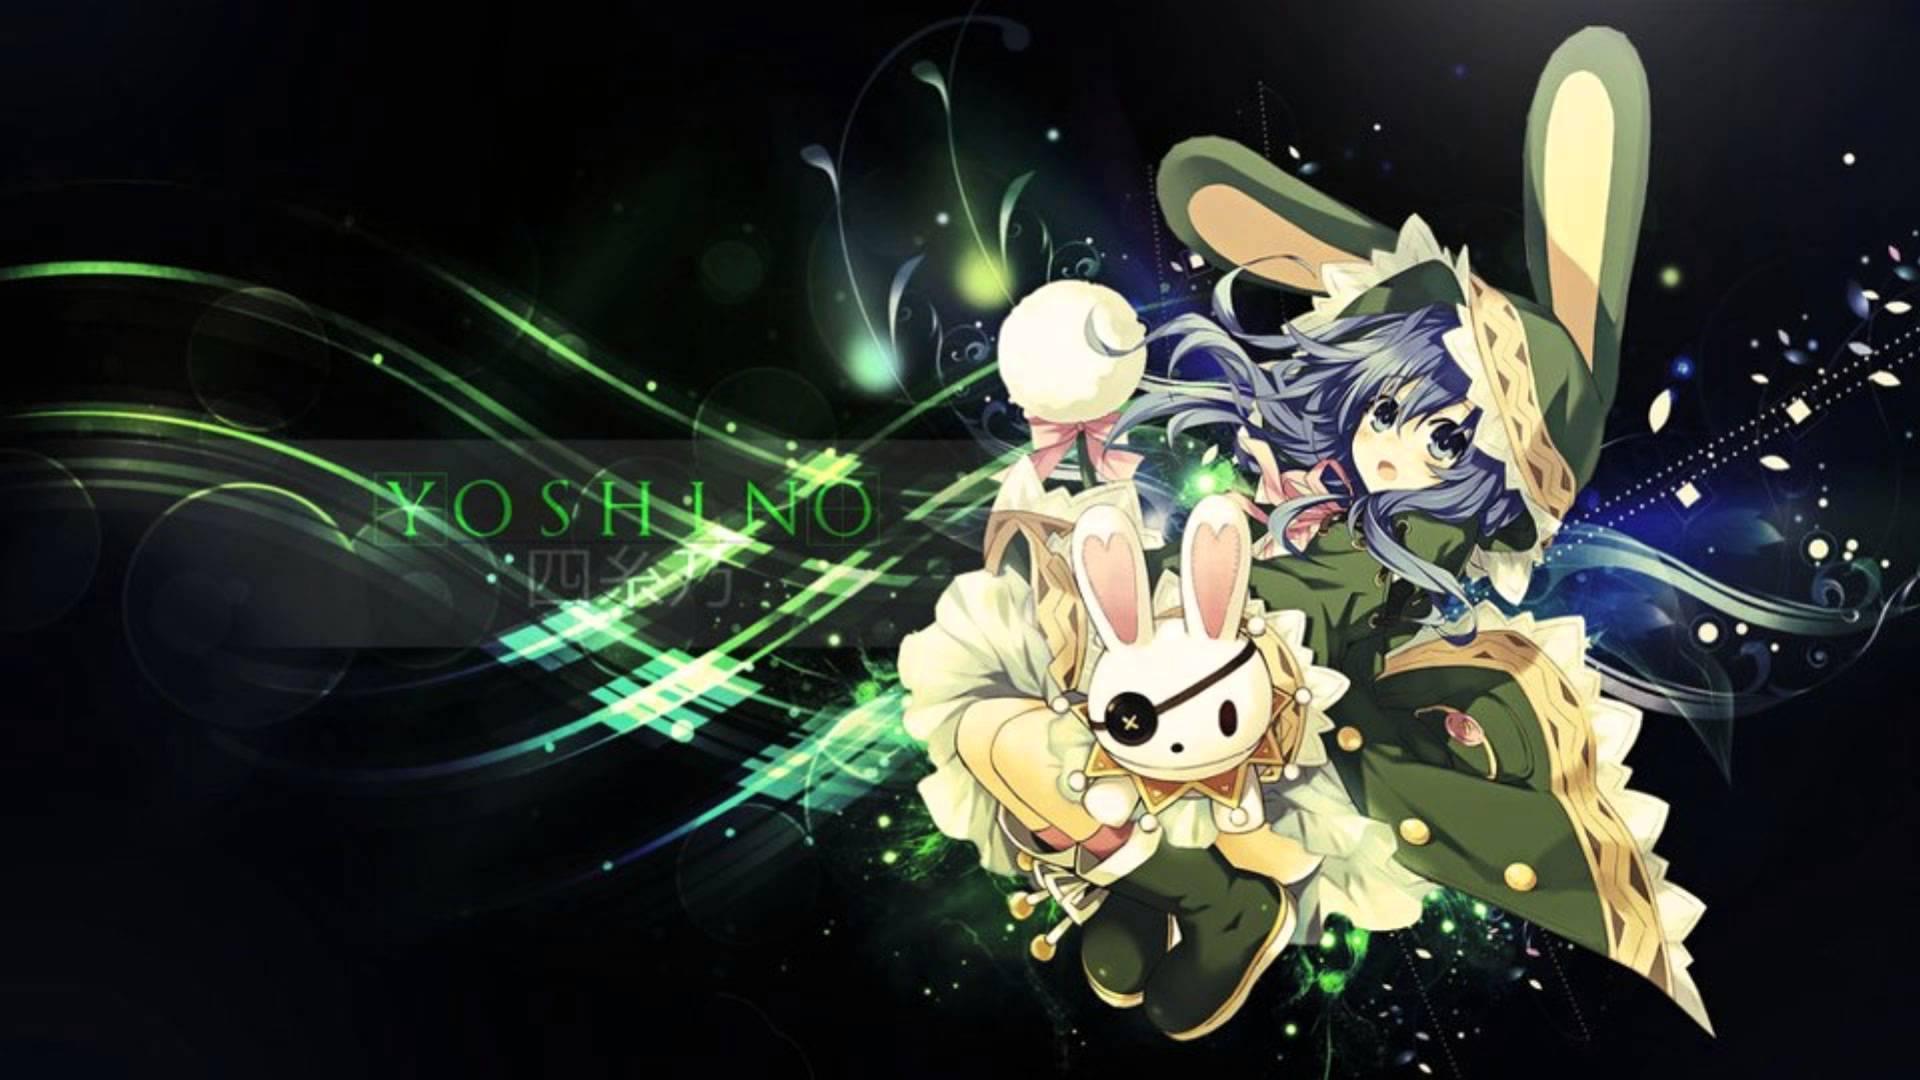 Anime Live Wallpapers for Desktop - WallpaperSafari